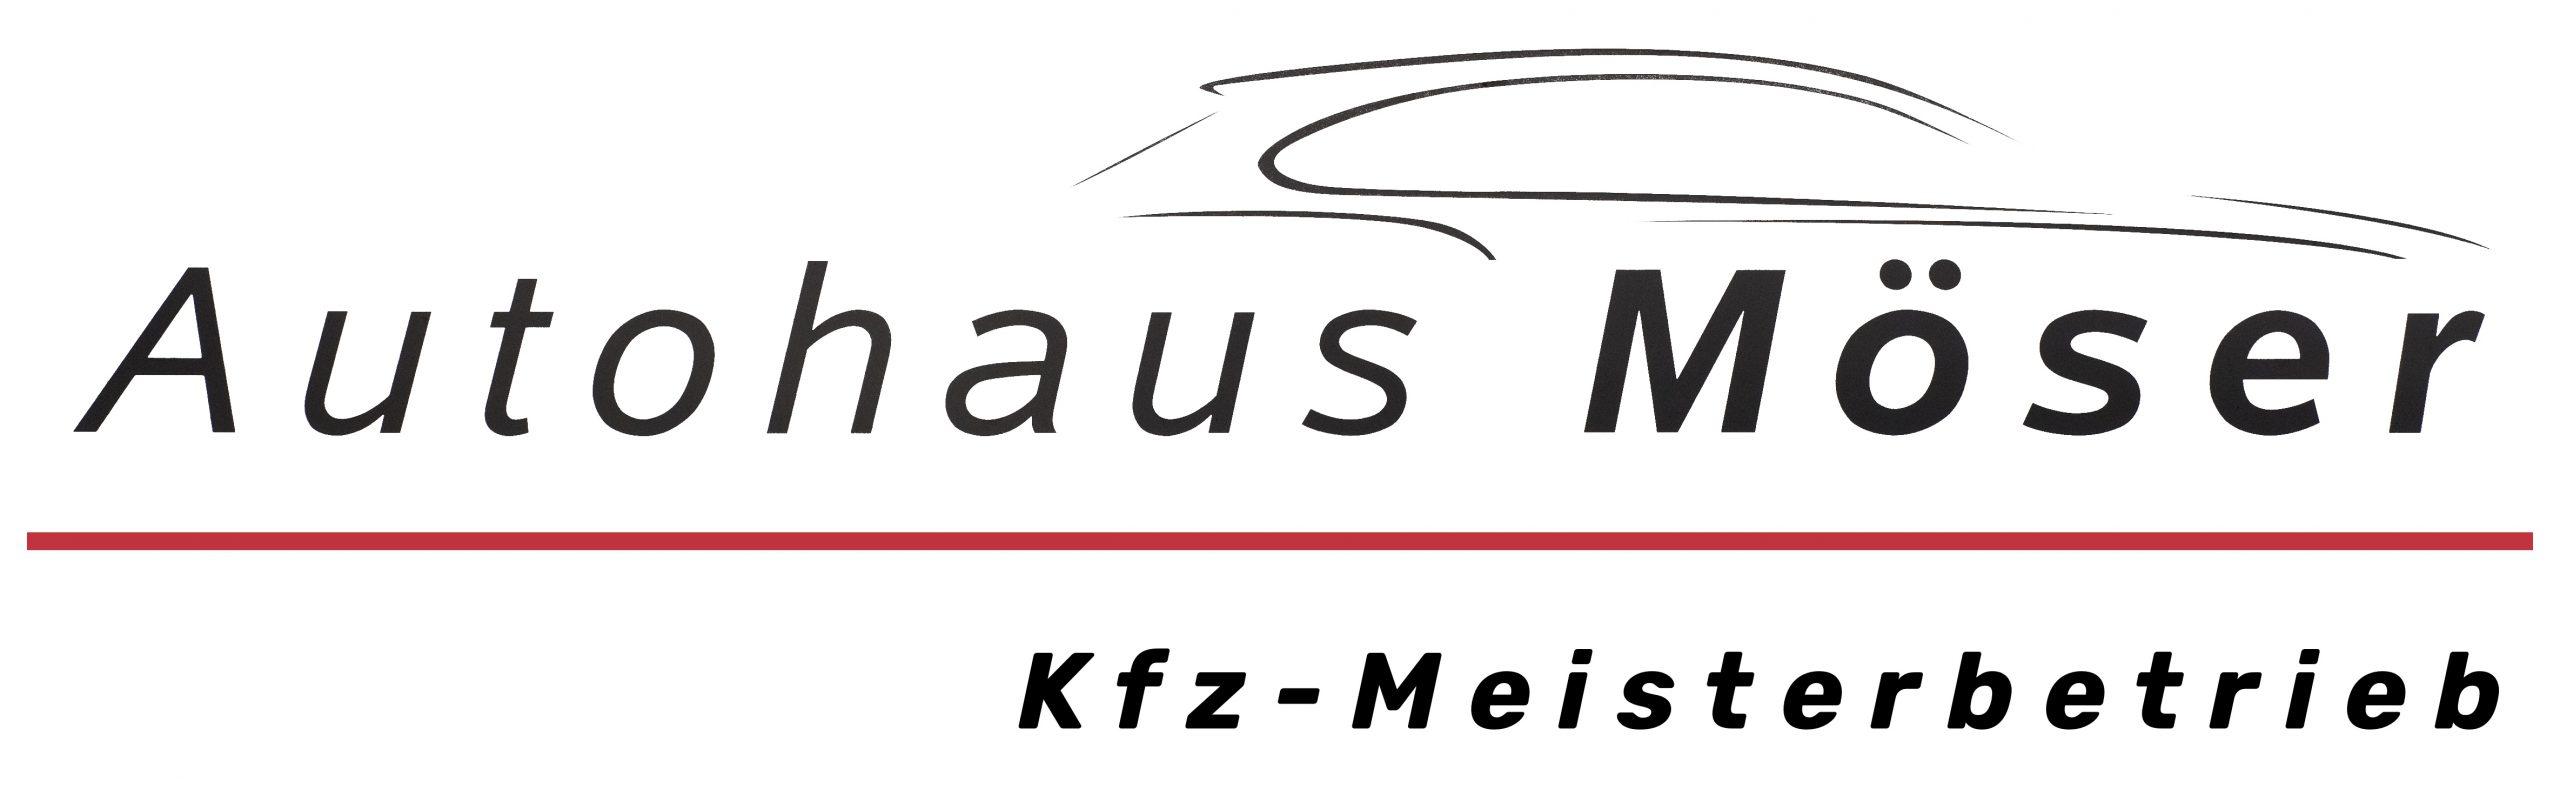 Autohaus Möser Türkenfeld